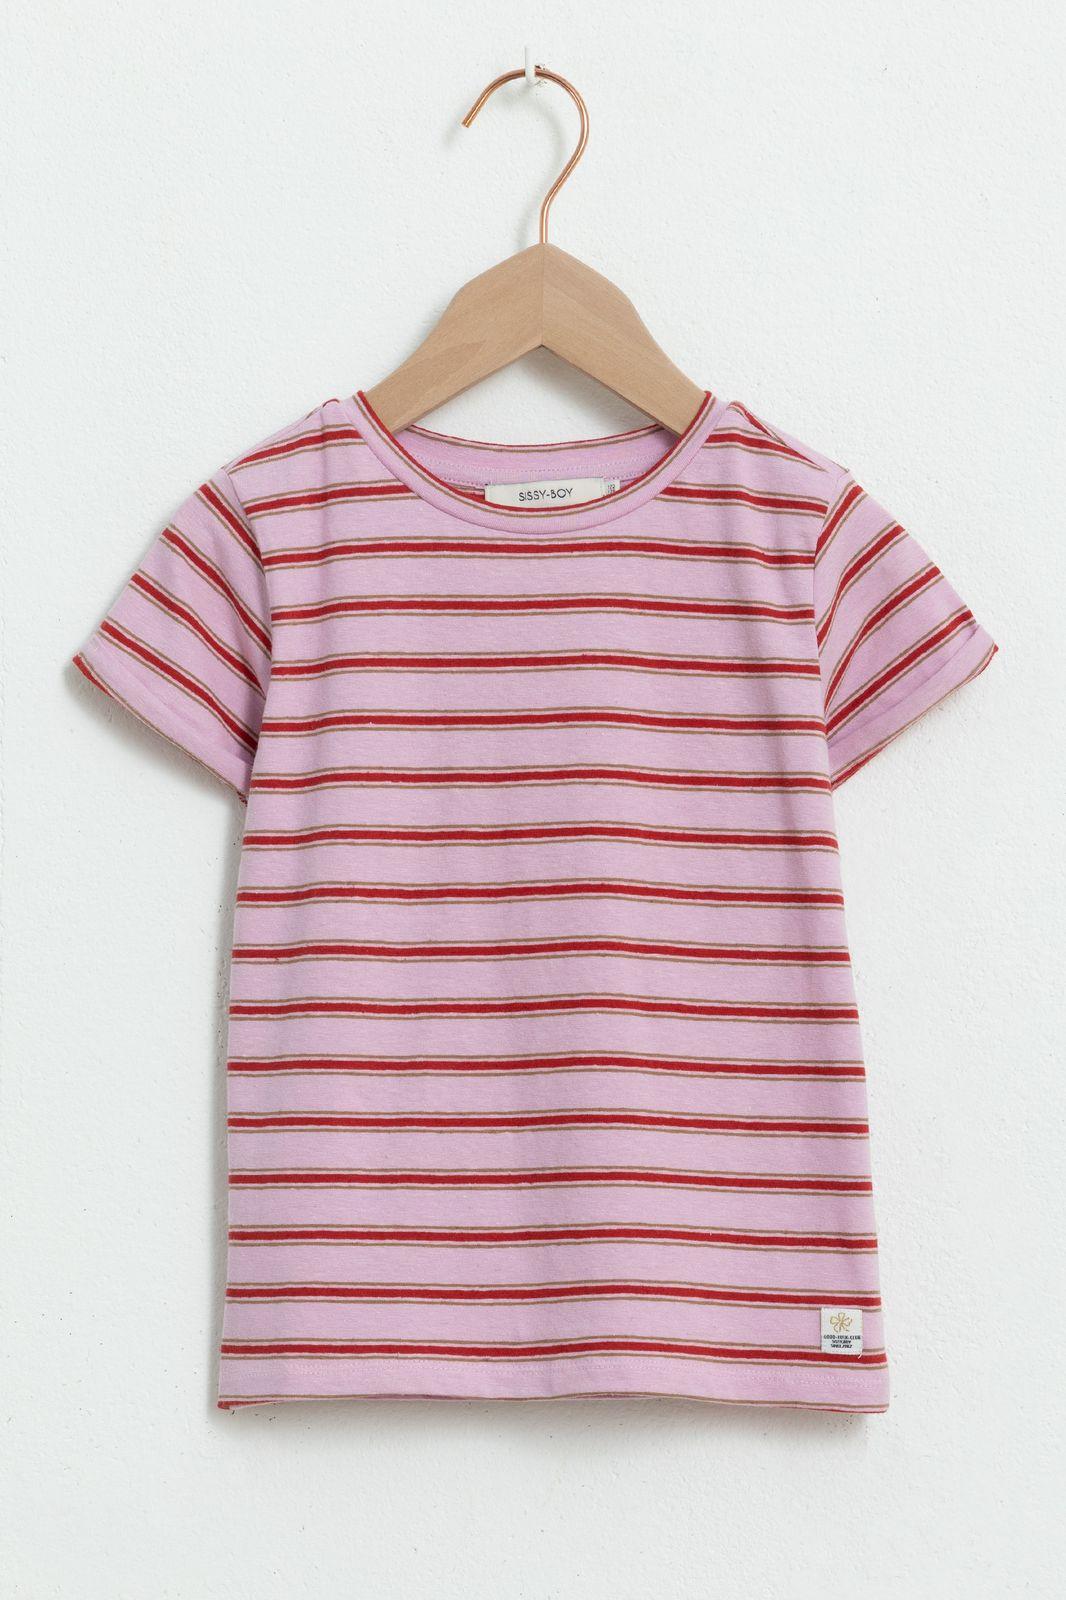 Multicolor gestreept T-shirt met korte mouwen - Kids | Sissy-Boy